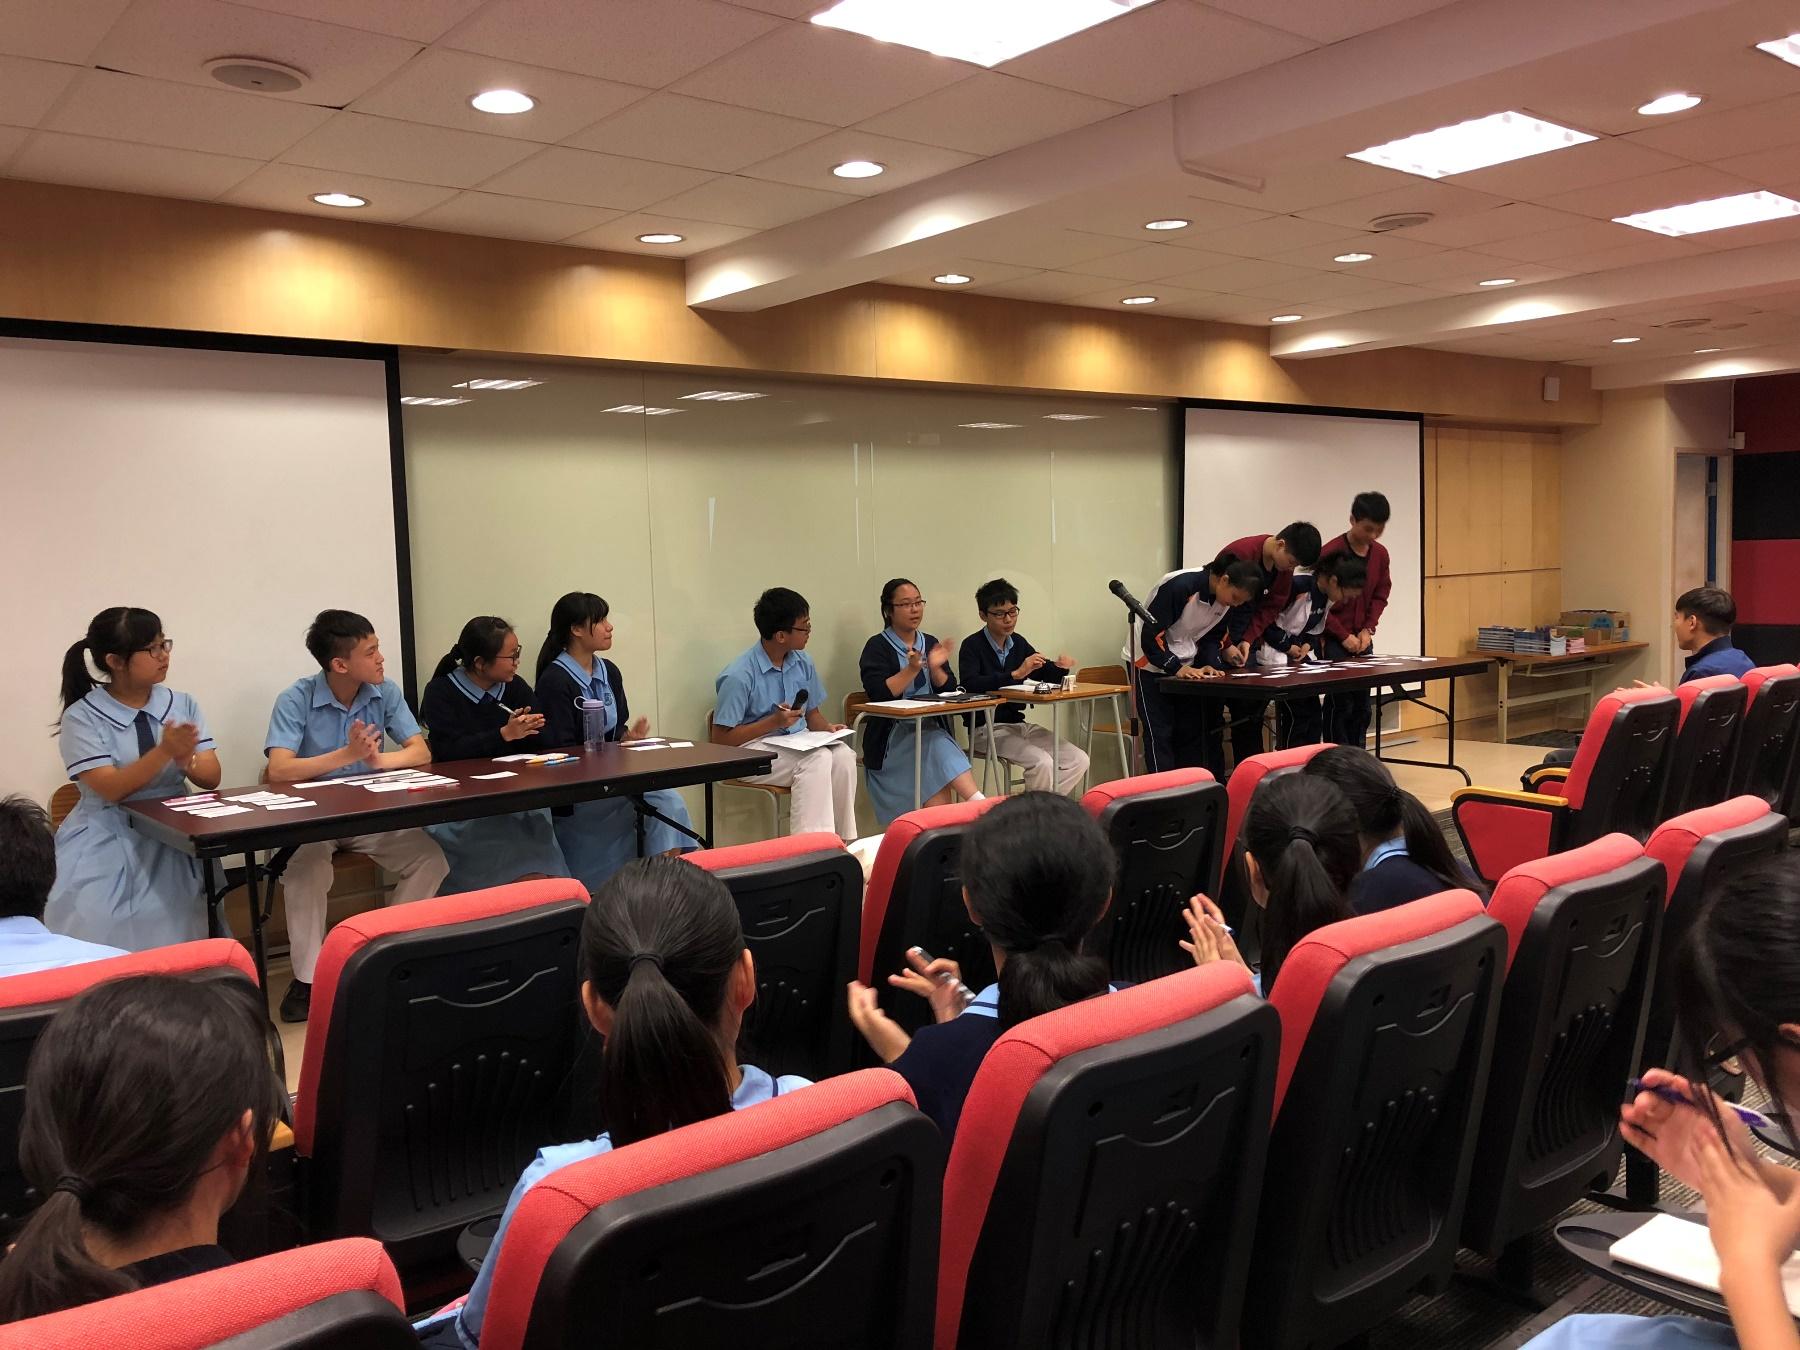 http://www.npc.edu.hk/sites/default/files/4_1100.jpg